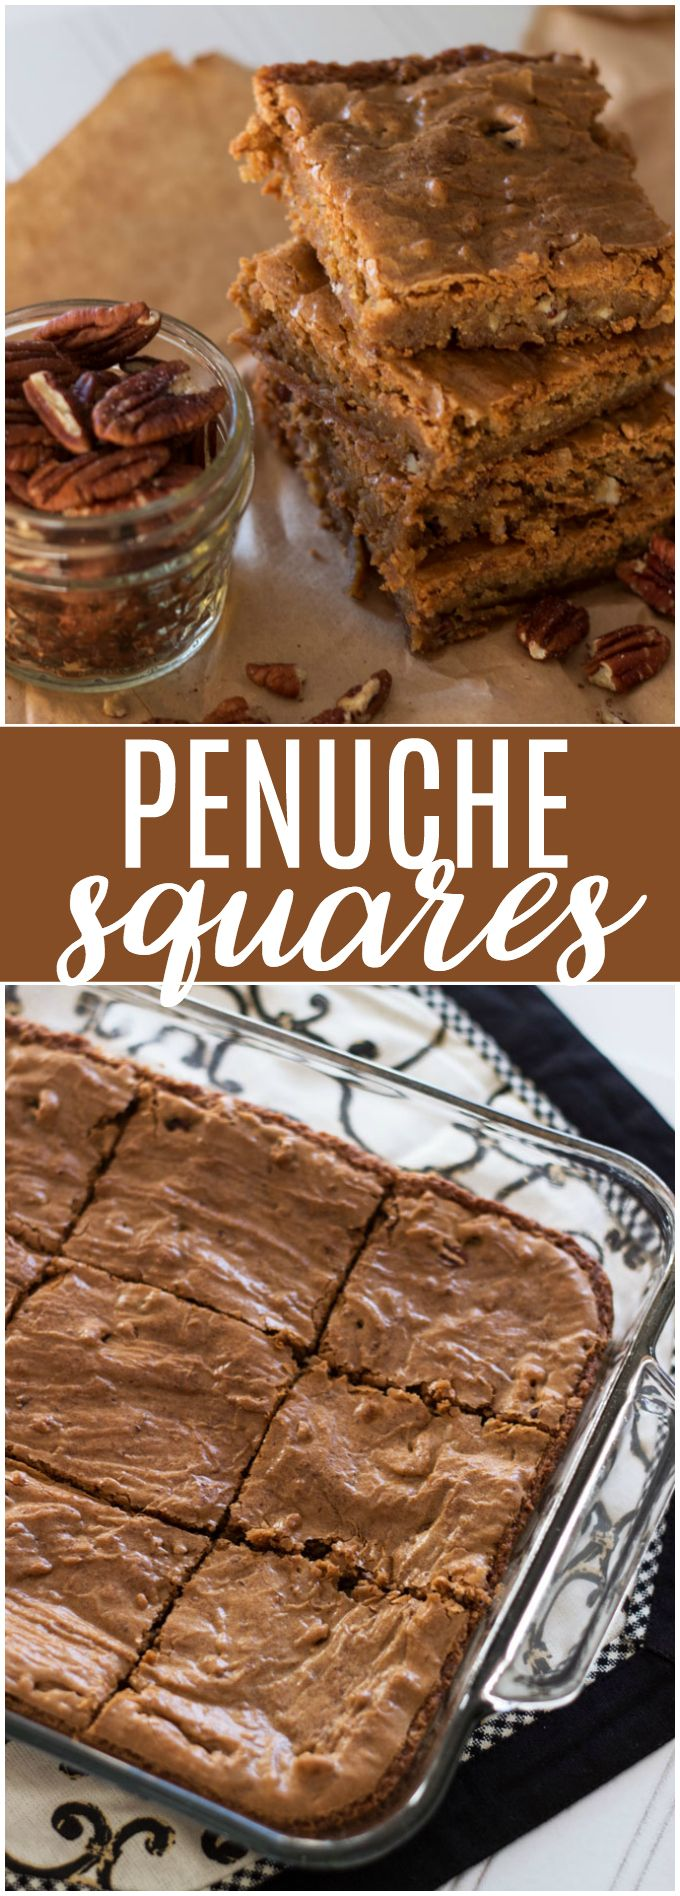 Penuche Squares Recipe Dessert Bar Recipe Favorite Dessert Recipes Sweet Treats Recipes